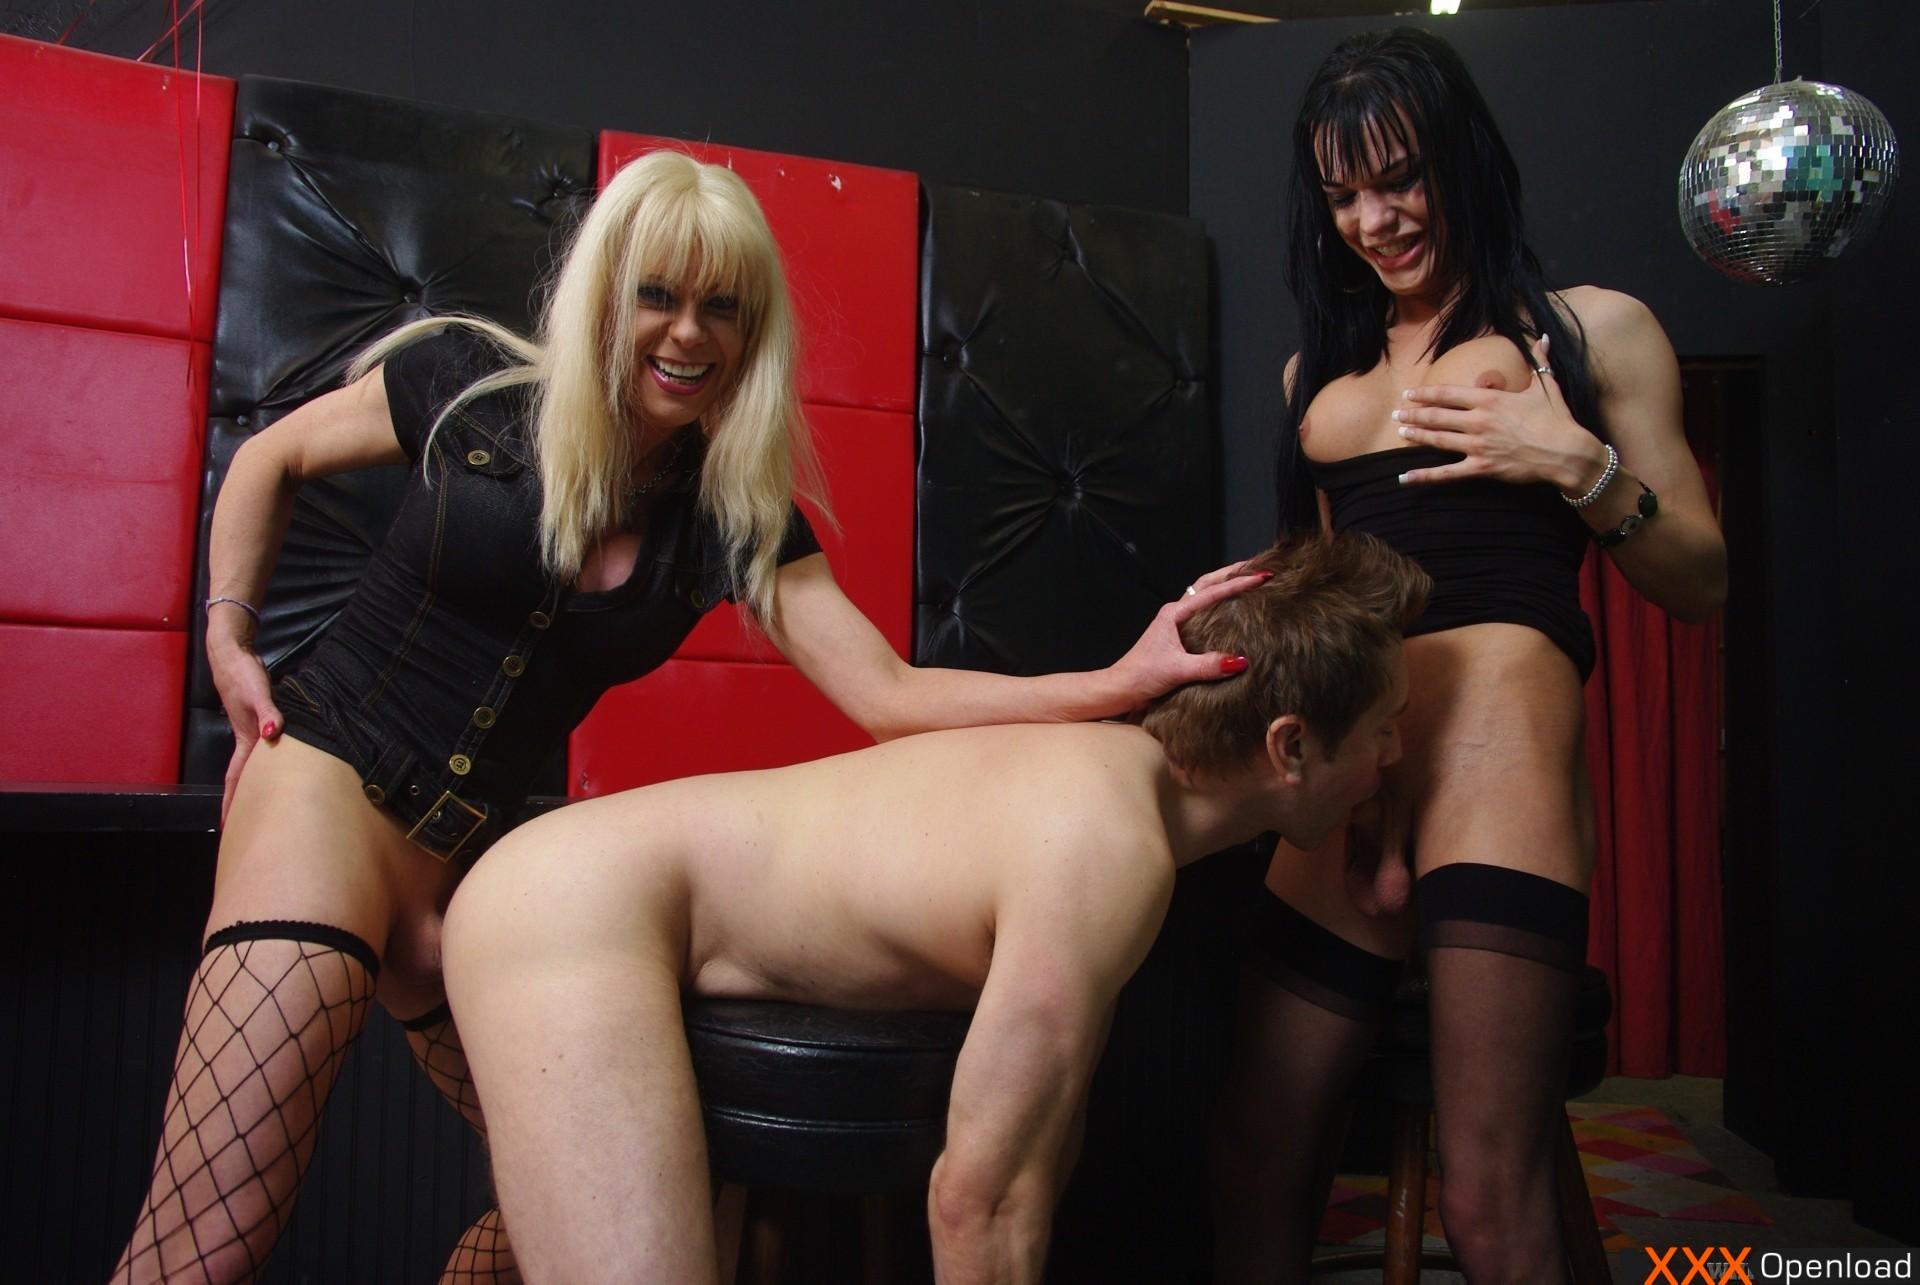 She Male Street Hookers #06, Scene #02 Whiteghetto 2015 Joanna Jet Blowjob, Shemale  Tranny